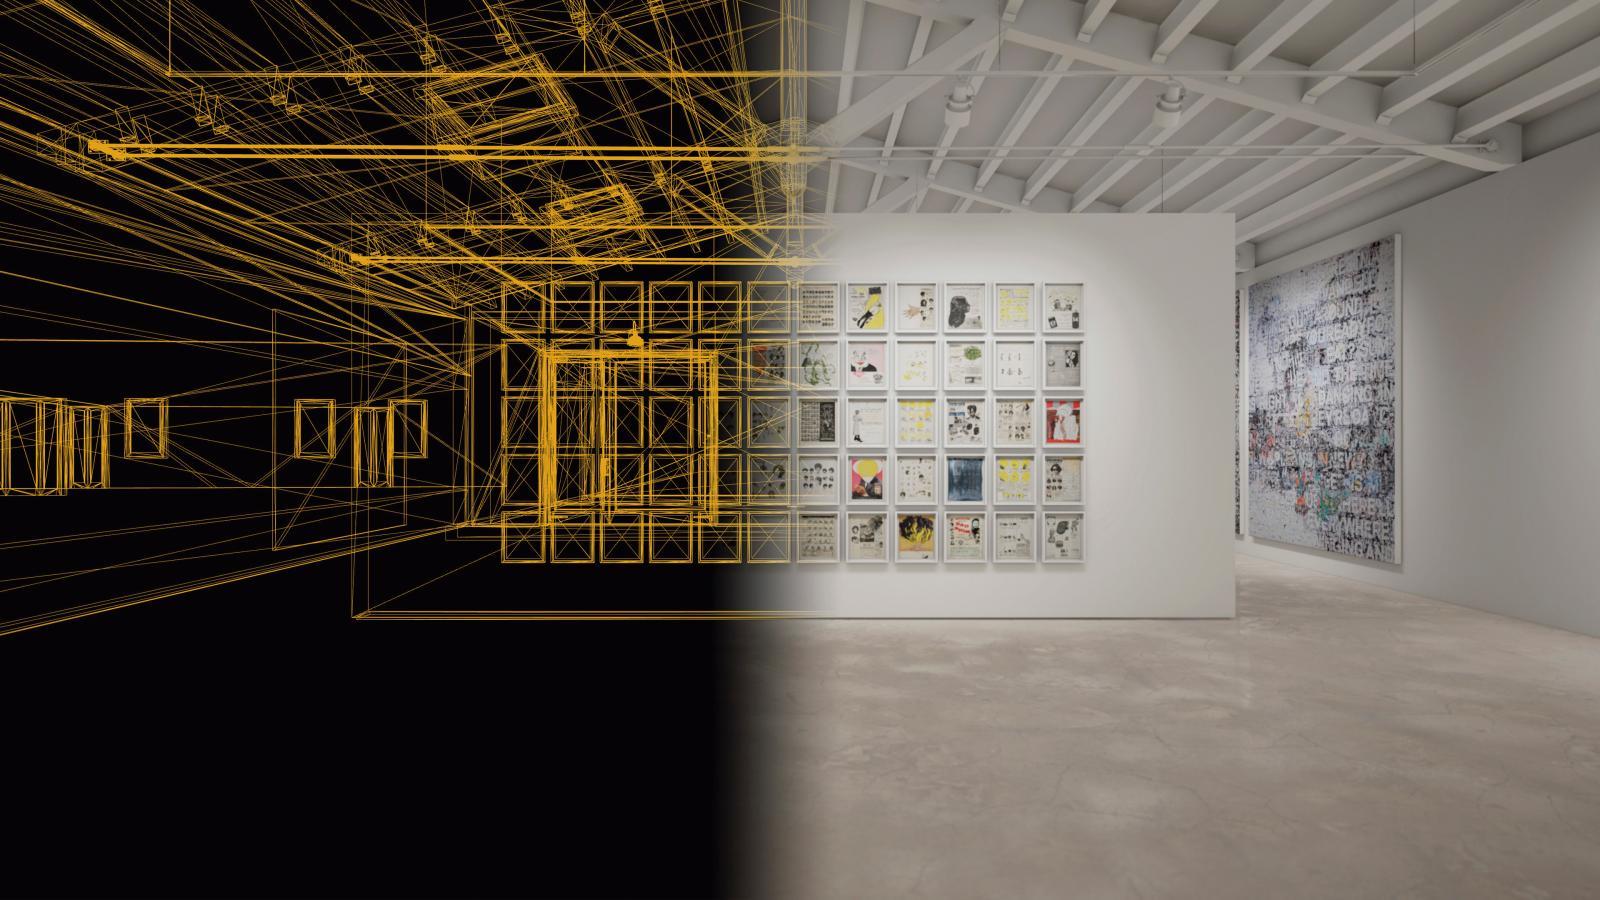 ArtLab, vue de l'installation d'Ellen Gallagher(née en 1965), DeLuxe, 2004-2005, et Mark Bradford(né en 1961), Chicago, 2019, en HWVR. C